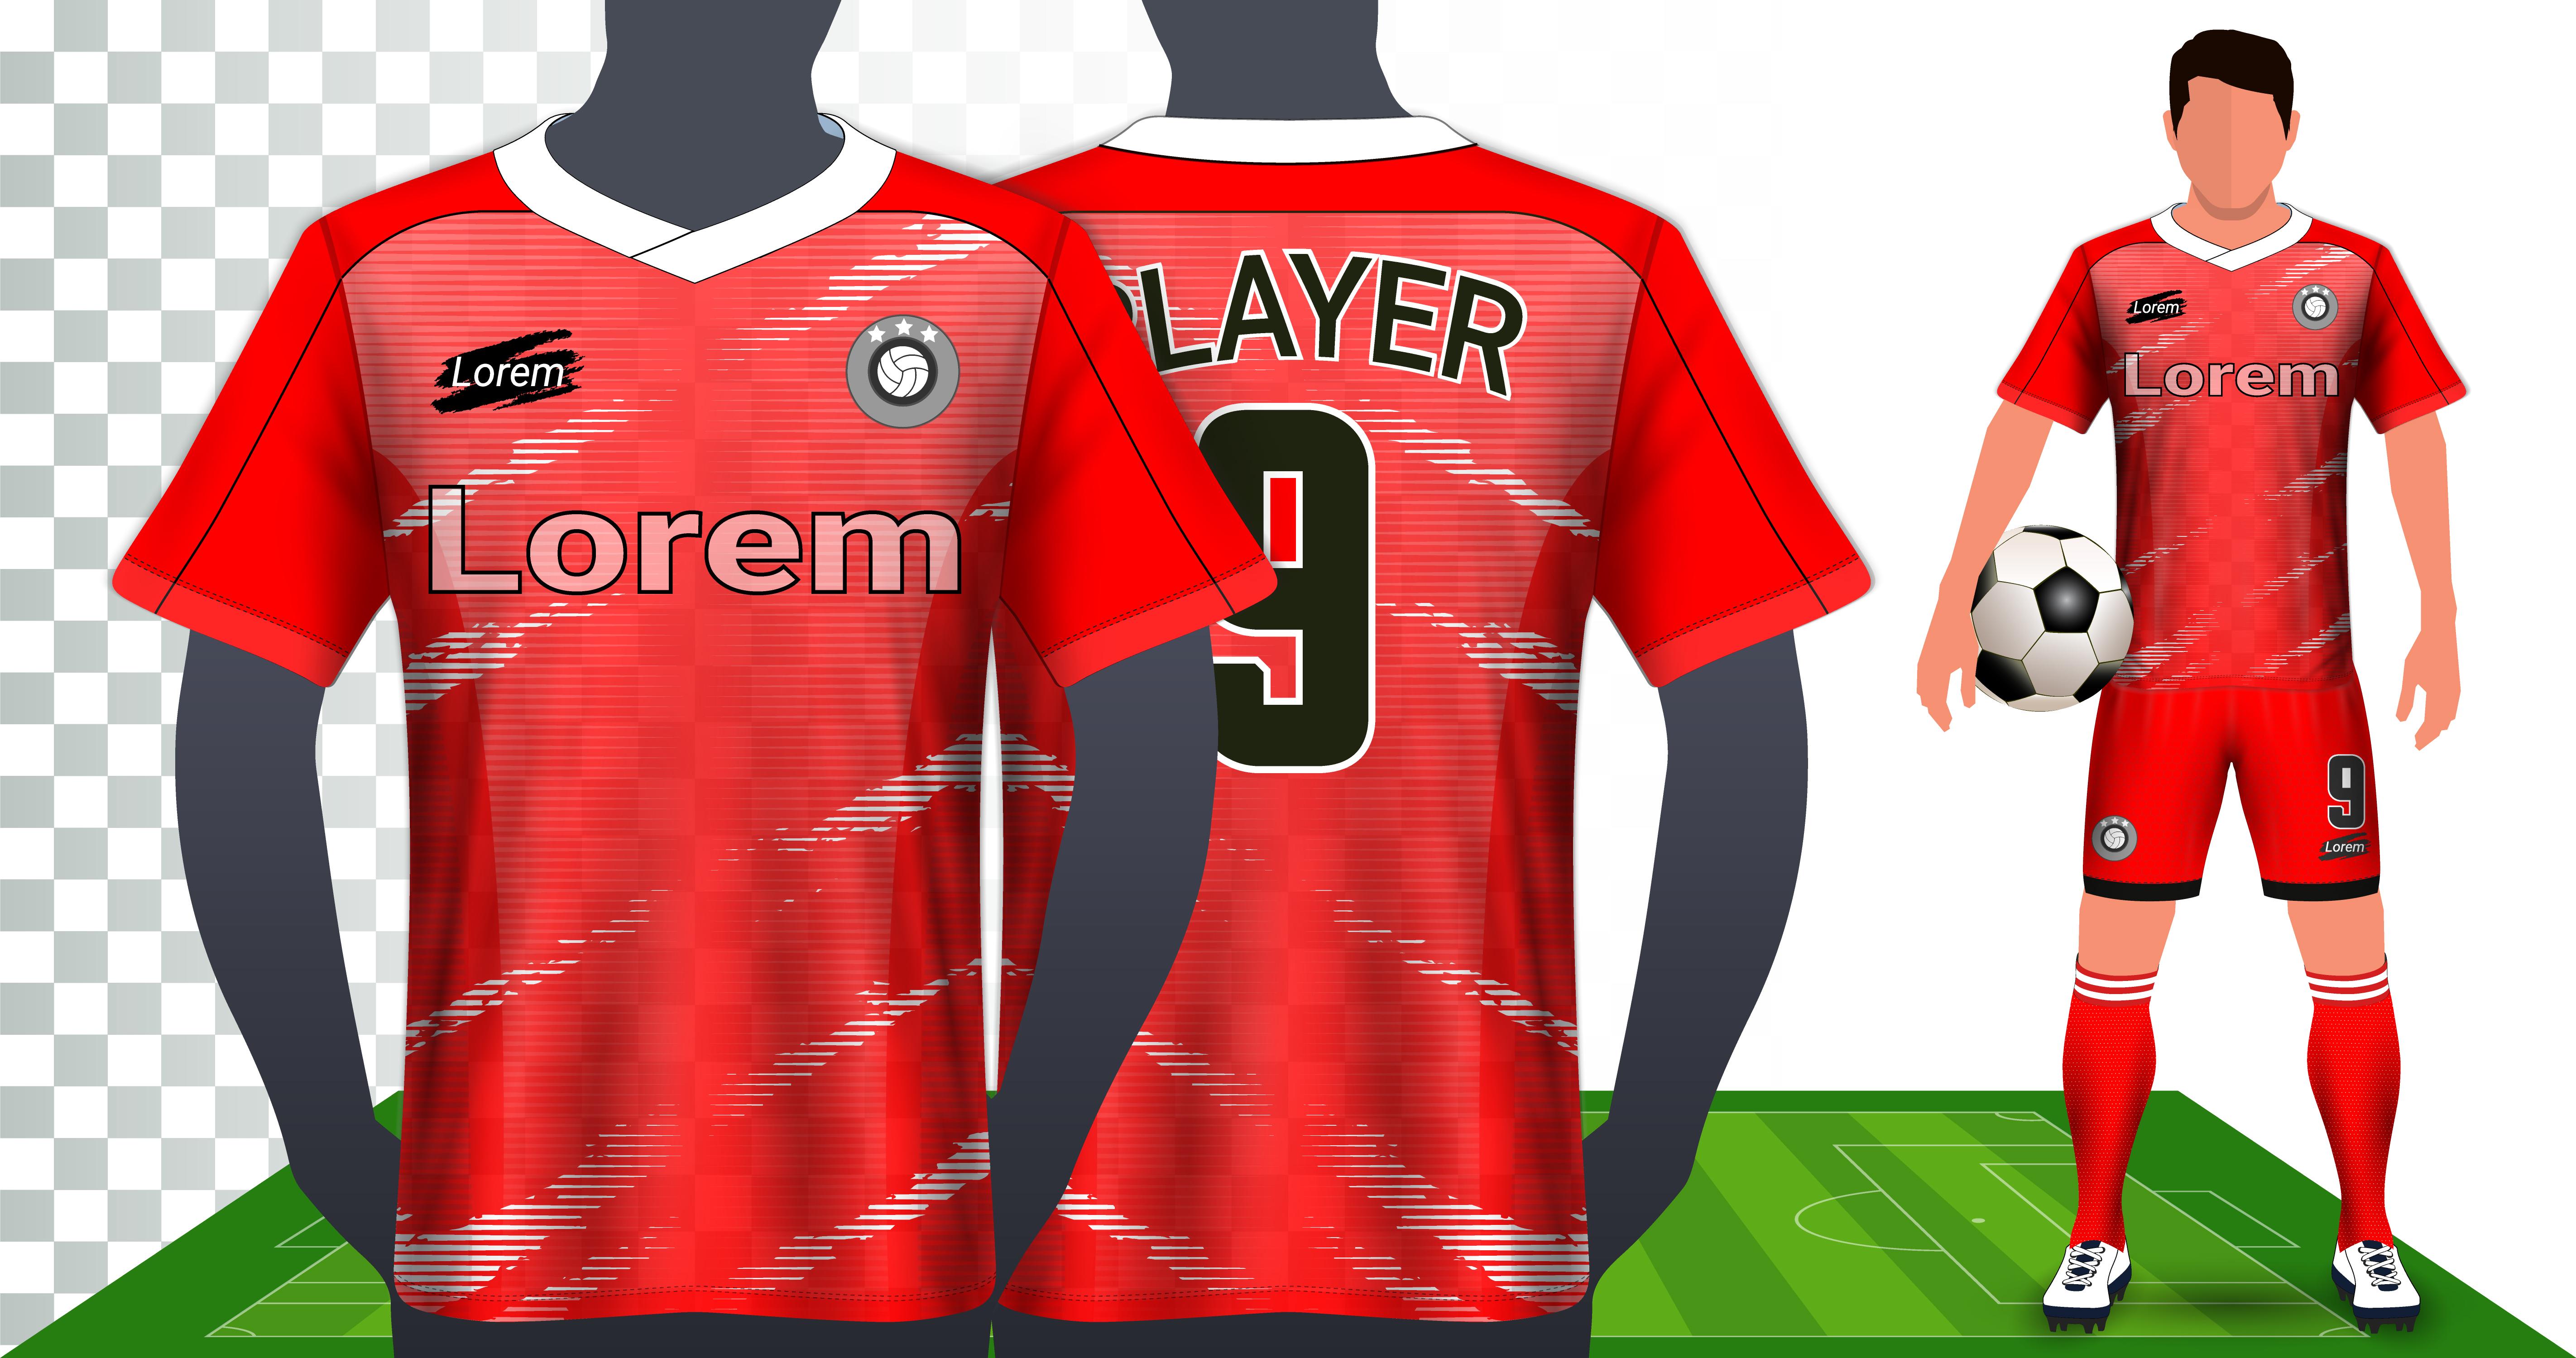 vector soccer jersey sport shirt or football kit uniform presentation mockup template